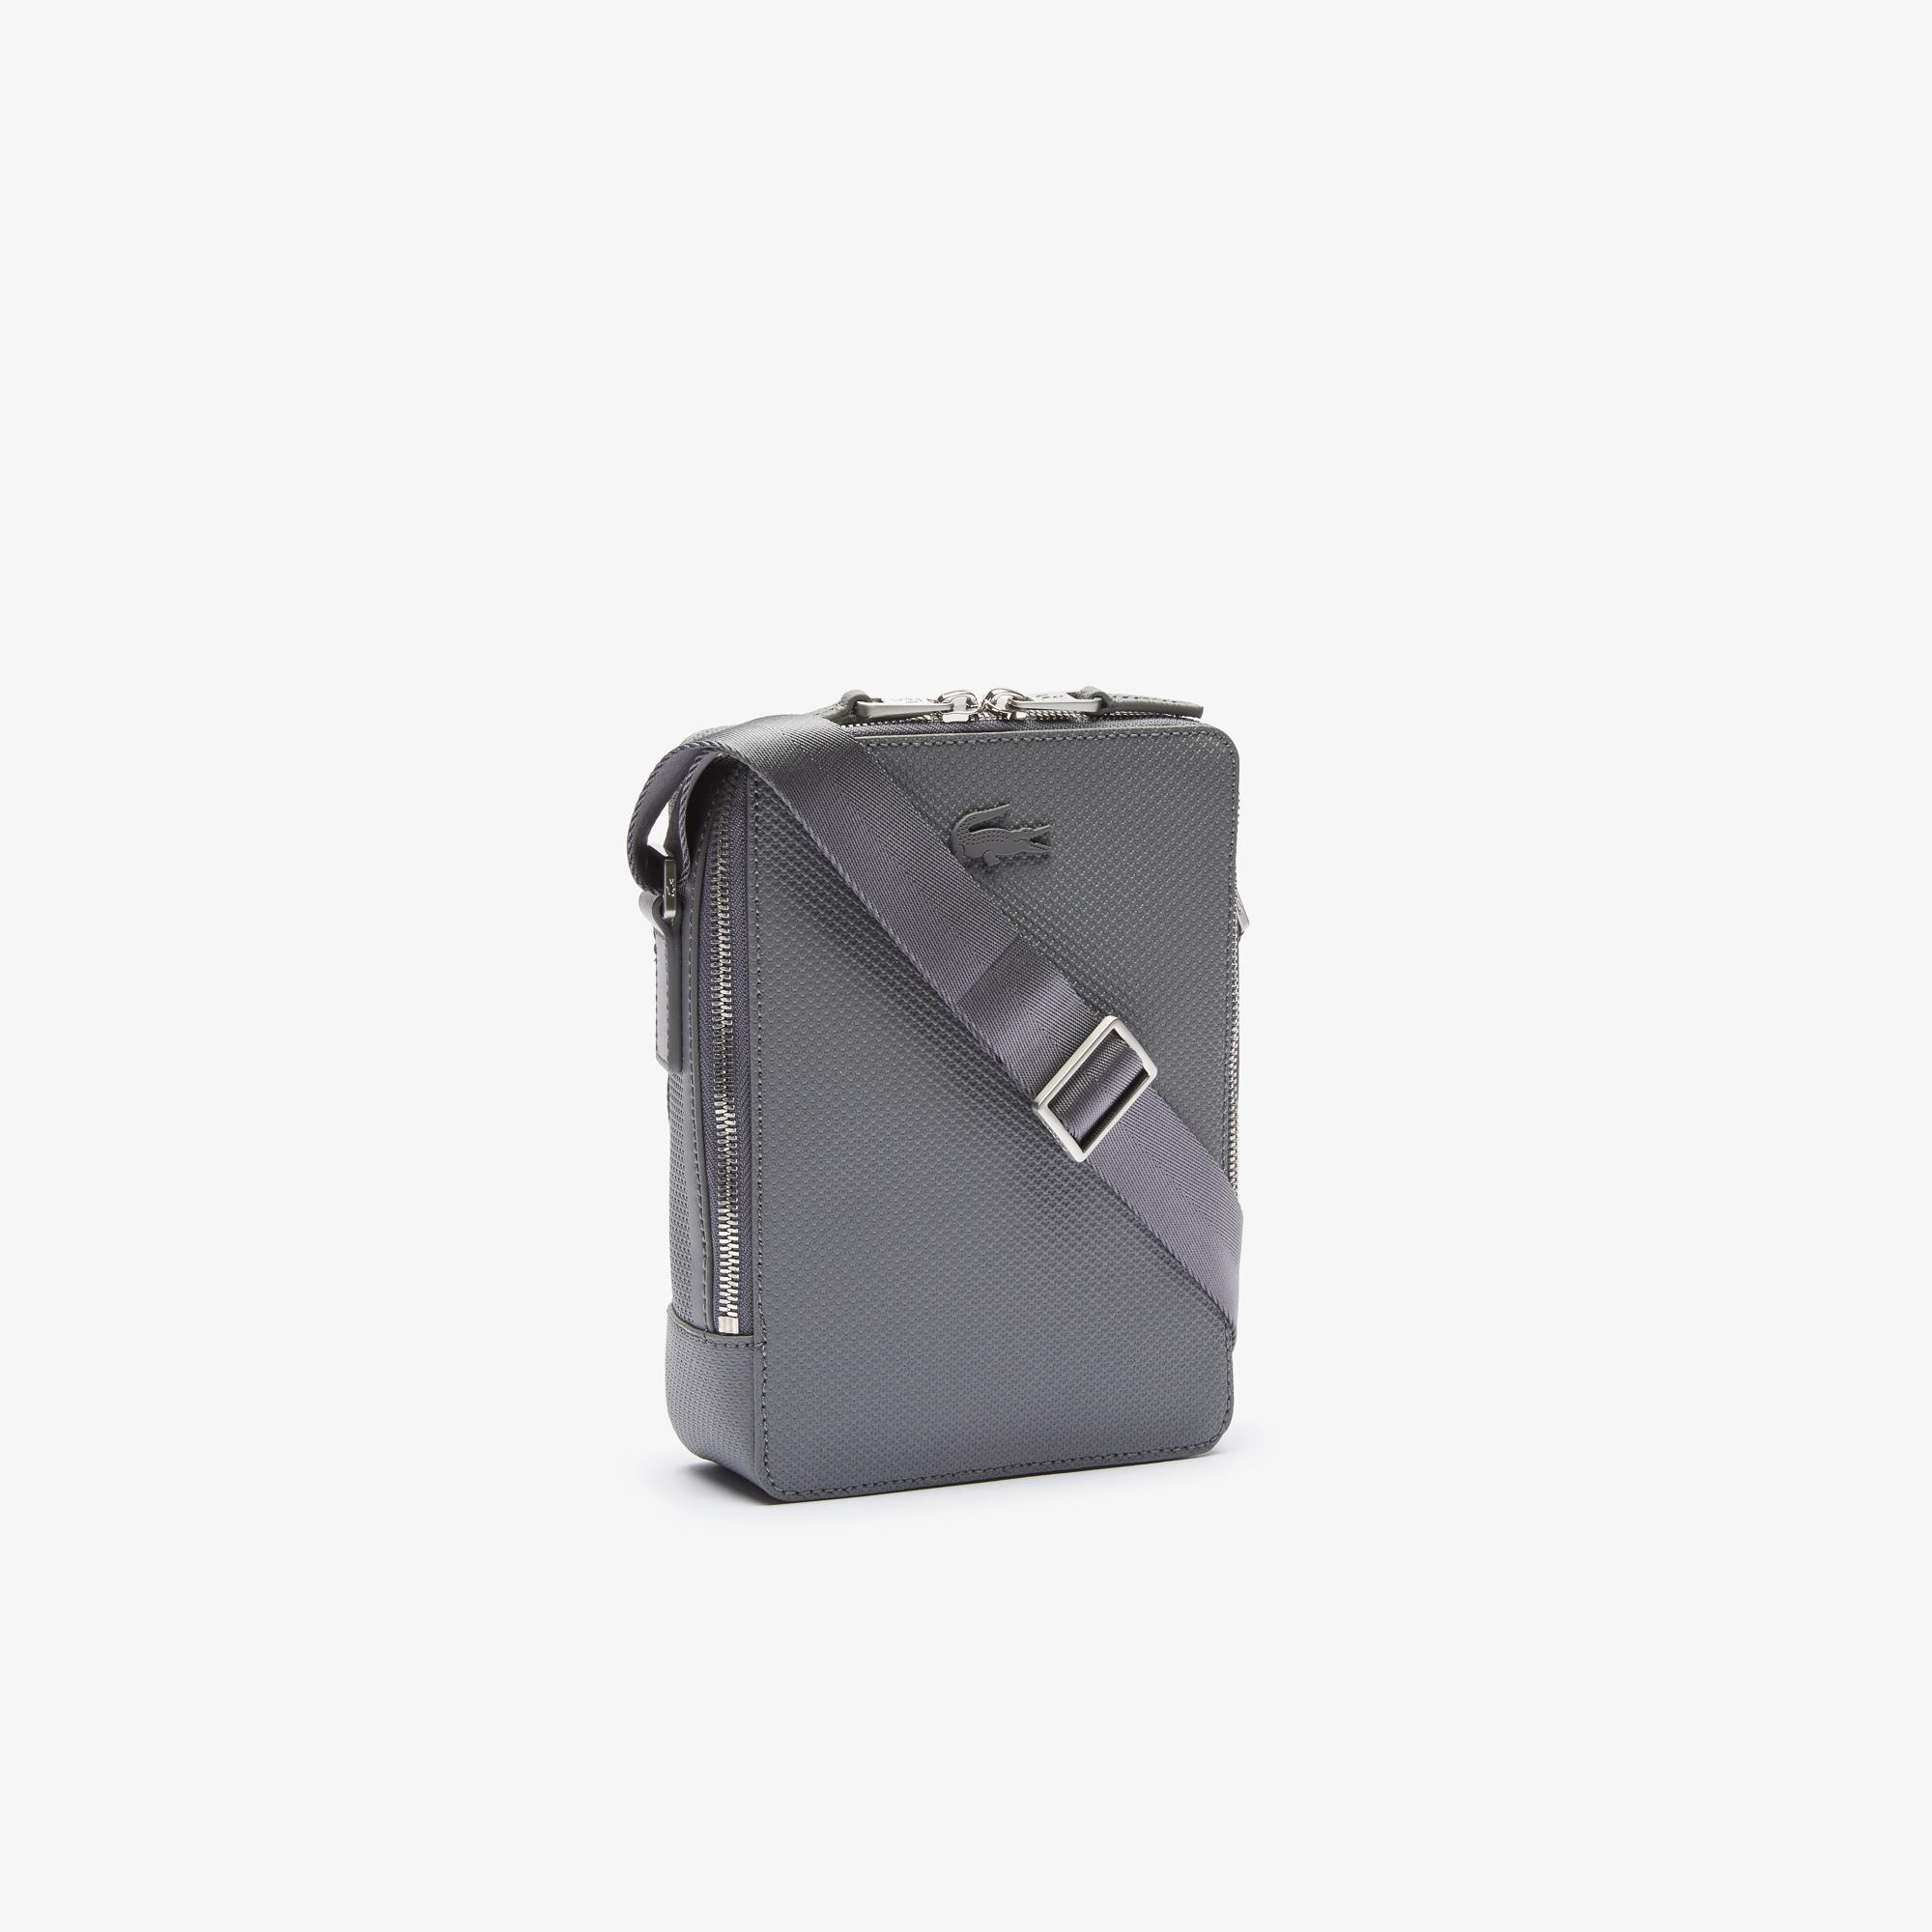 Lacoste сумка чоловіча Chantaco